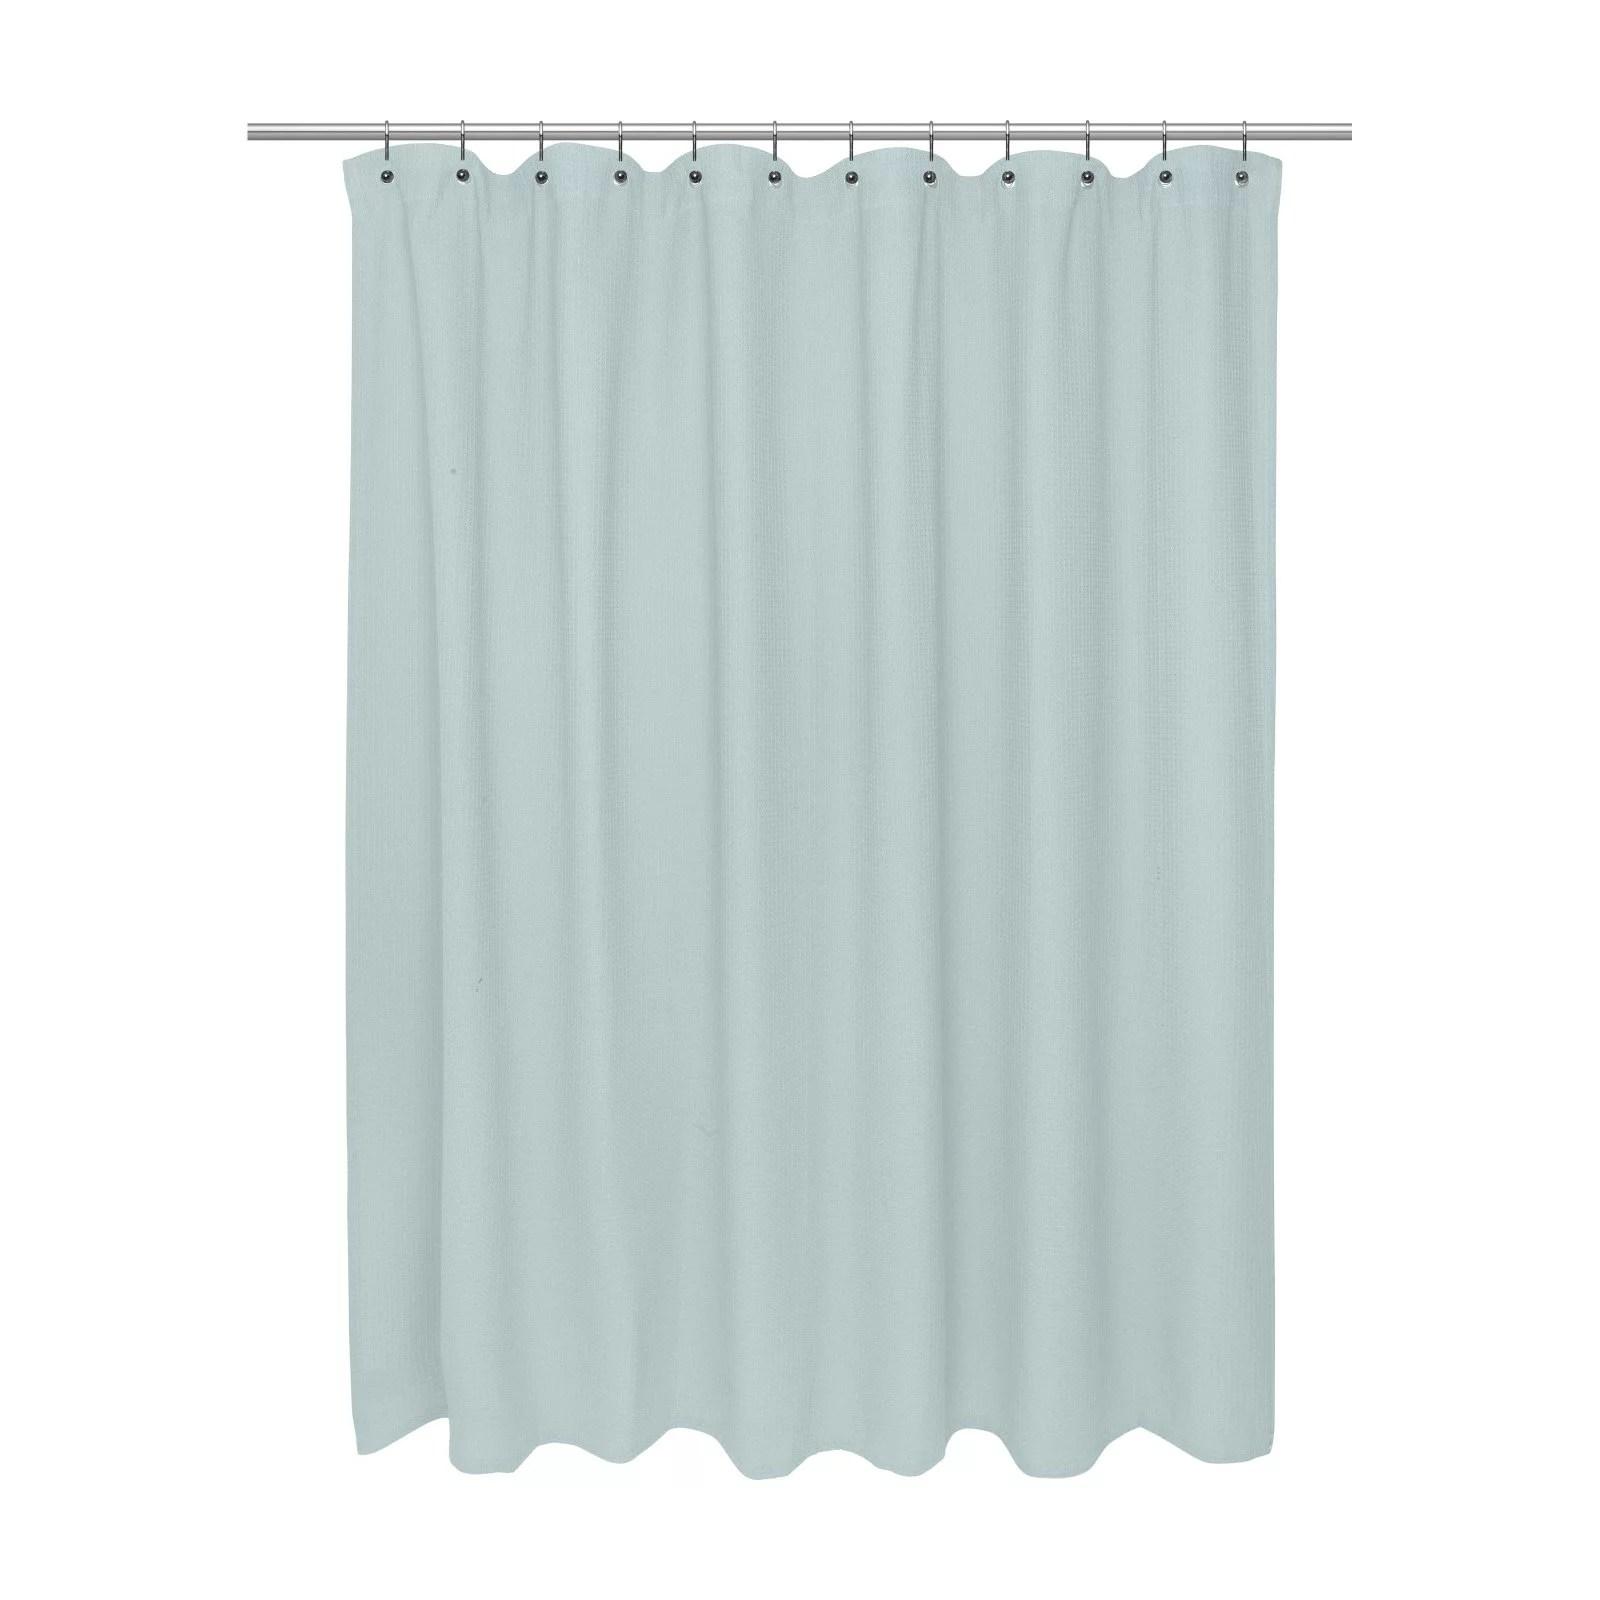 extra long size 100 cotton waffle weave shower curtain spa blue walmart com